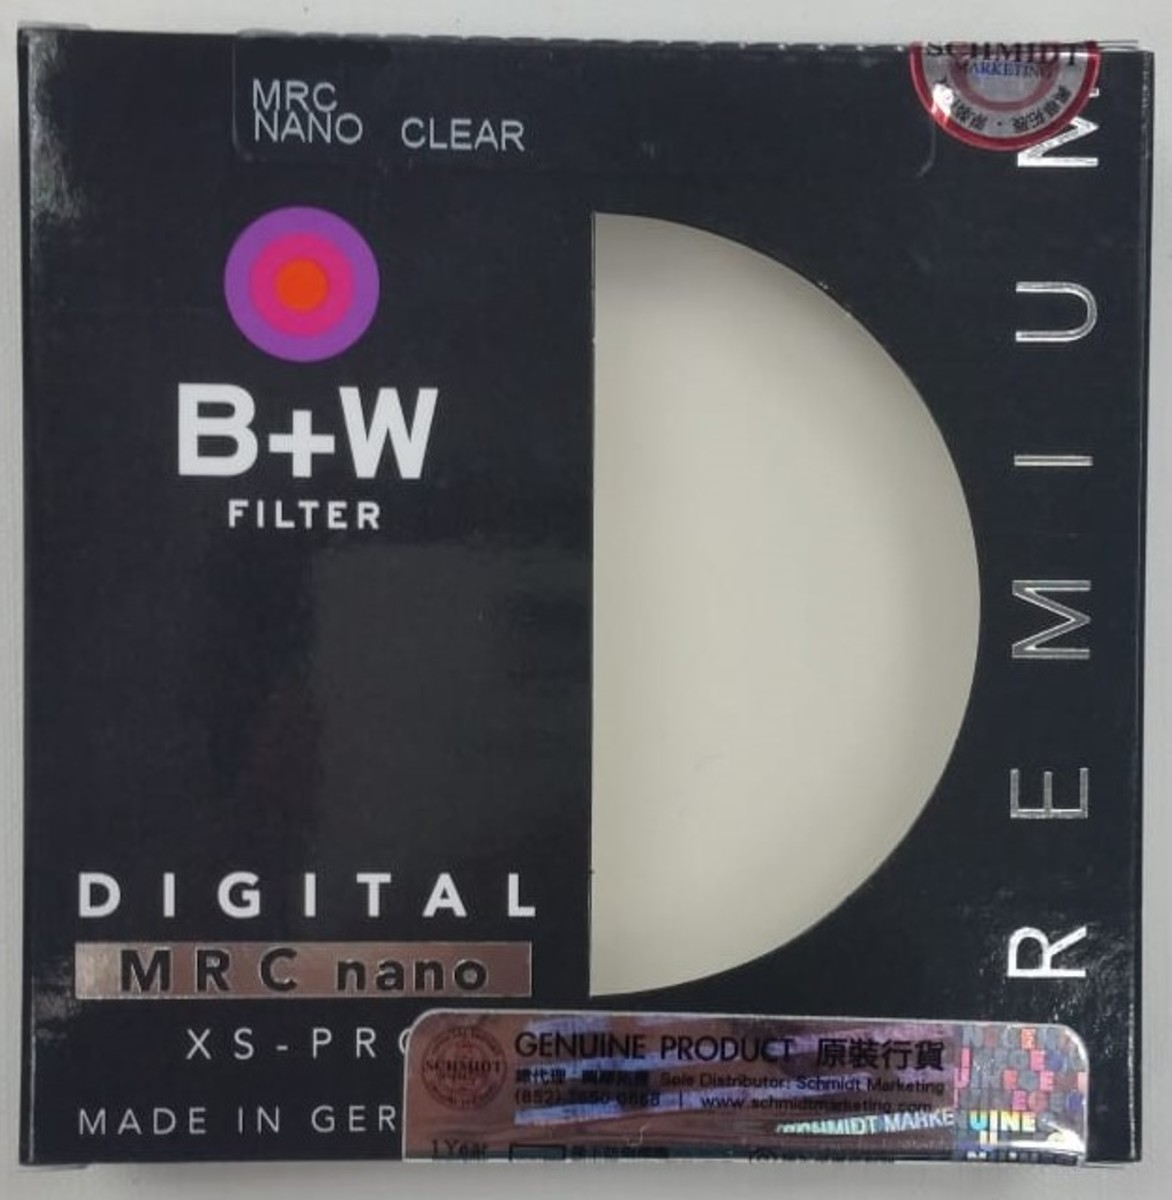 67mm XS-Pro Digital 007 Clear filter MRC nano Protector頂級保護鏡